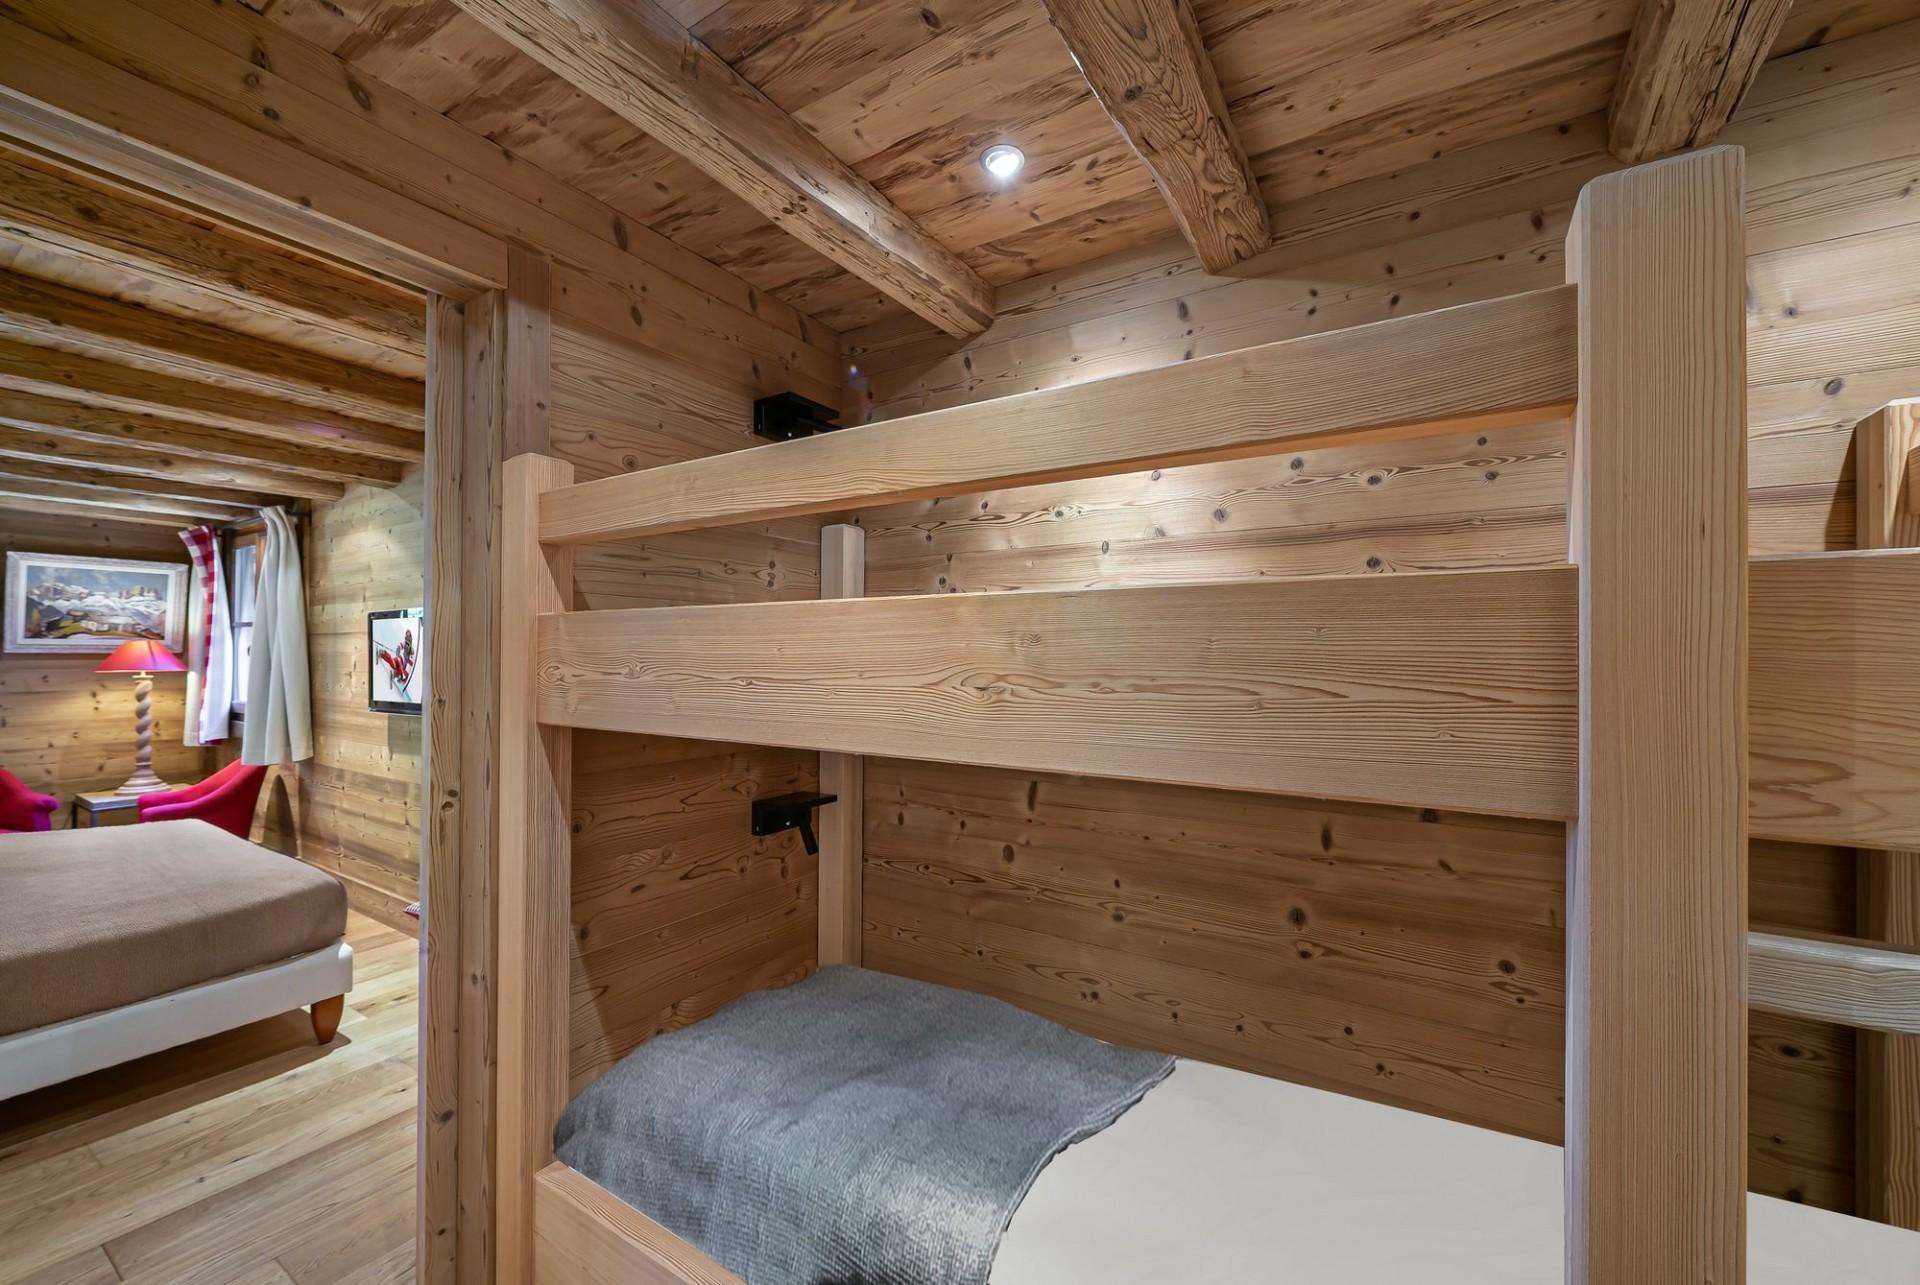 Courchevel 1550 Luxury Rental Chalet Niuréole Bedroom 4